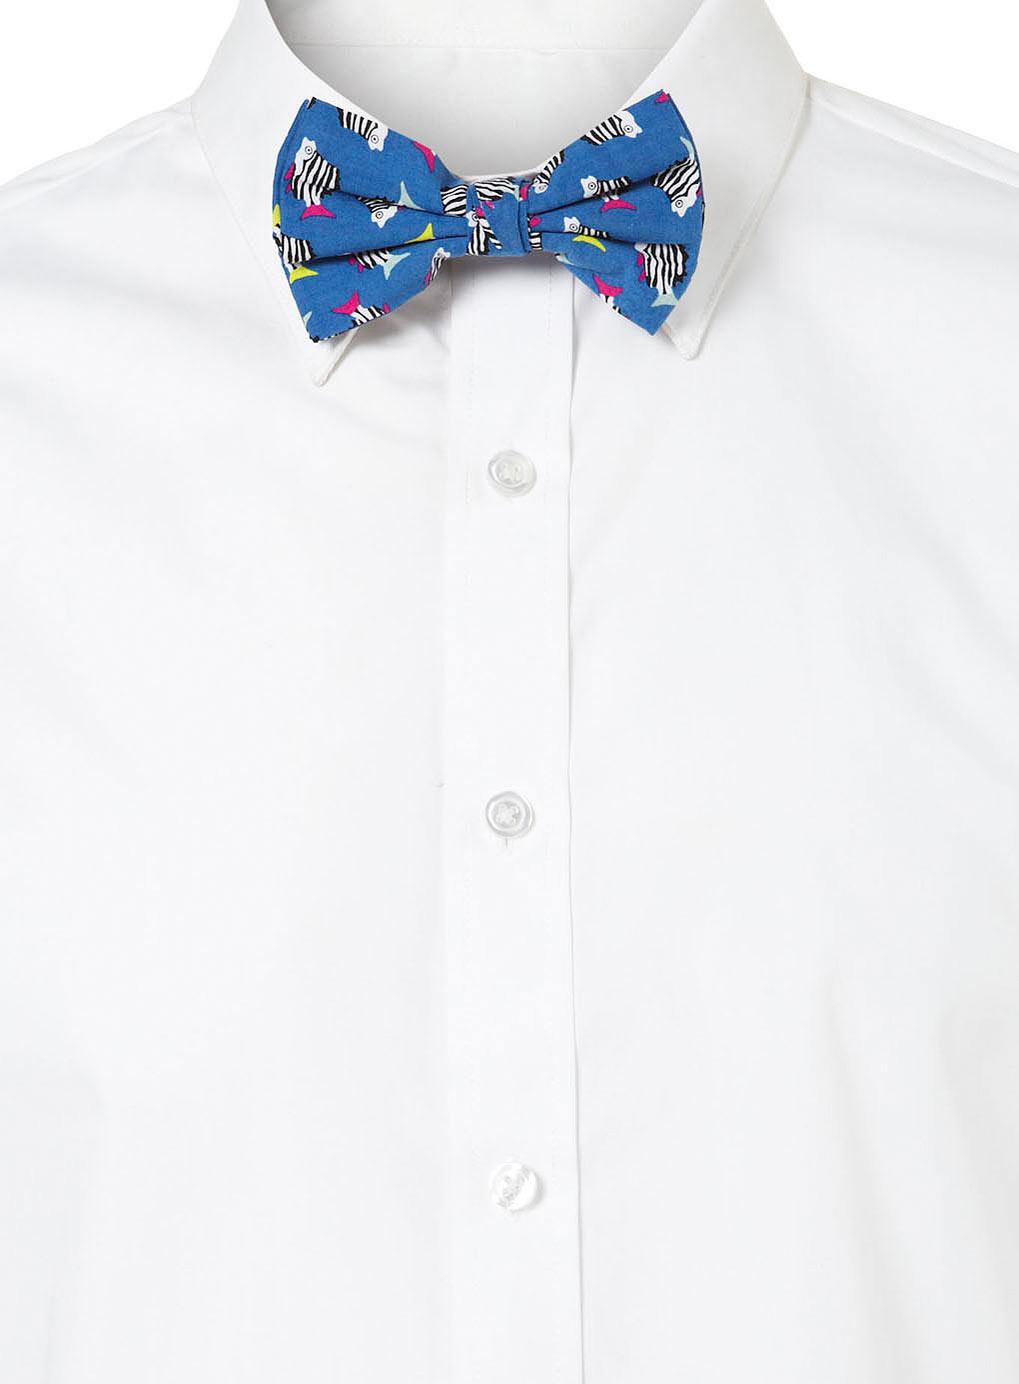 Topman Blue Zebra Fish Print Bow Tie In Blue For Men